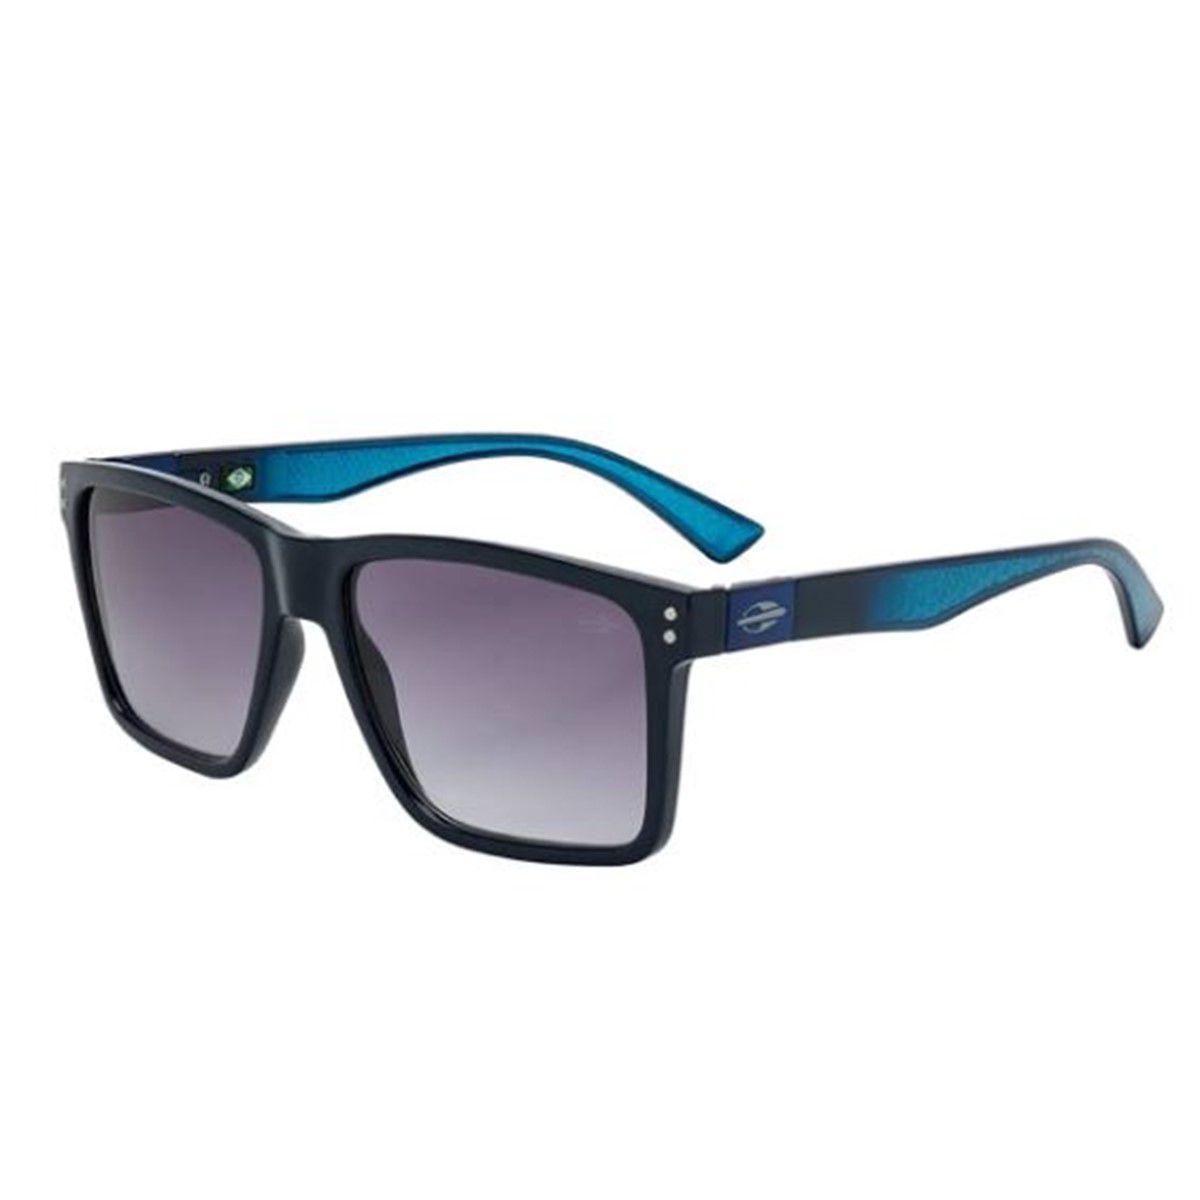 Óculos de Sol Mormaii Cairo Degrade Blue